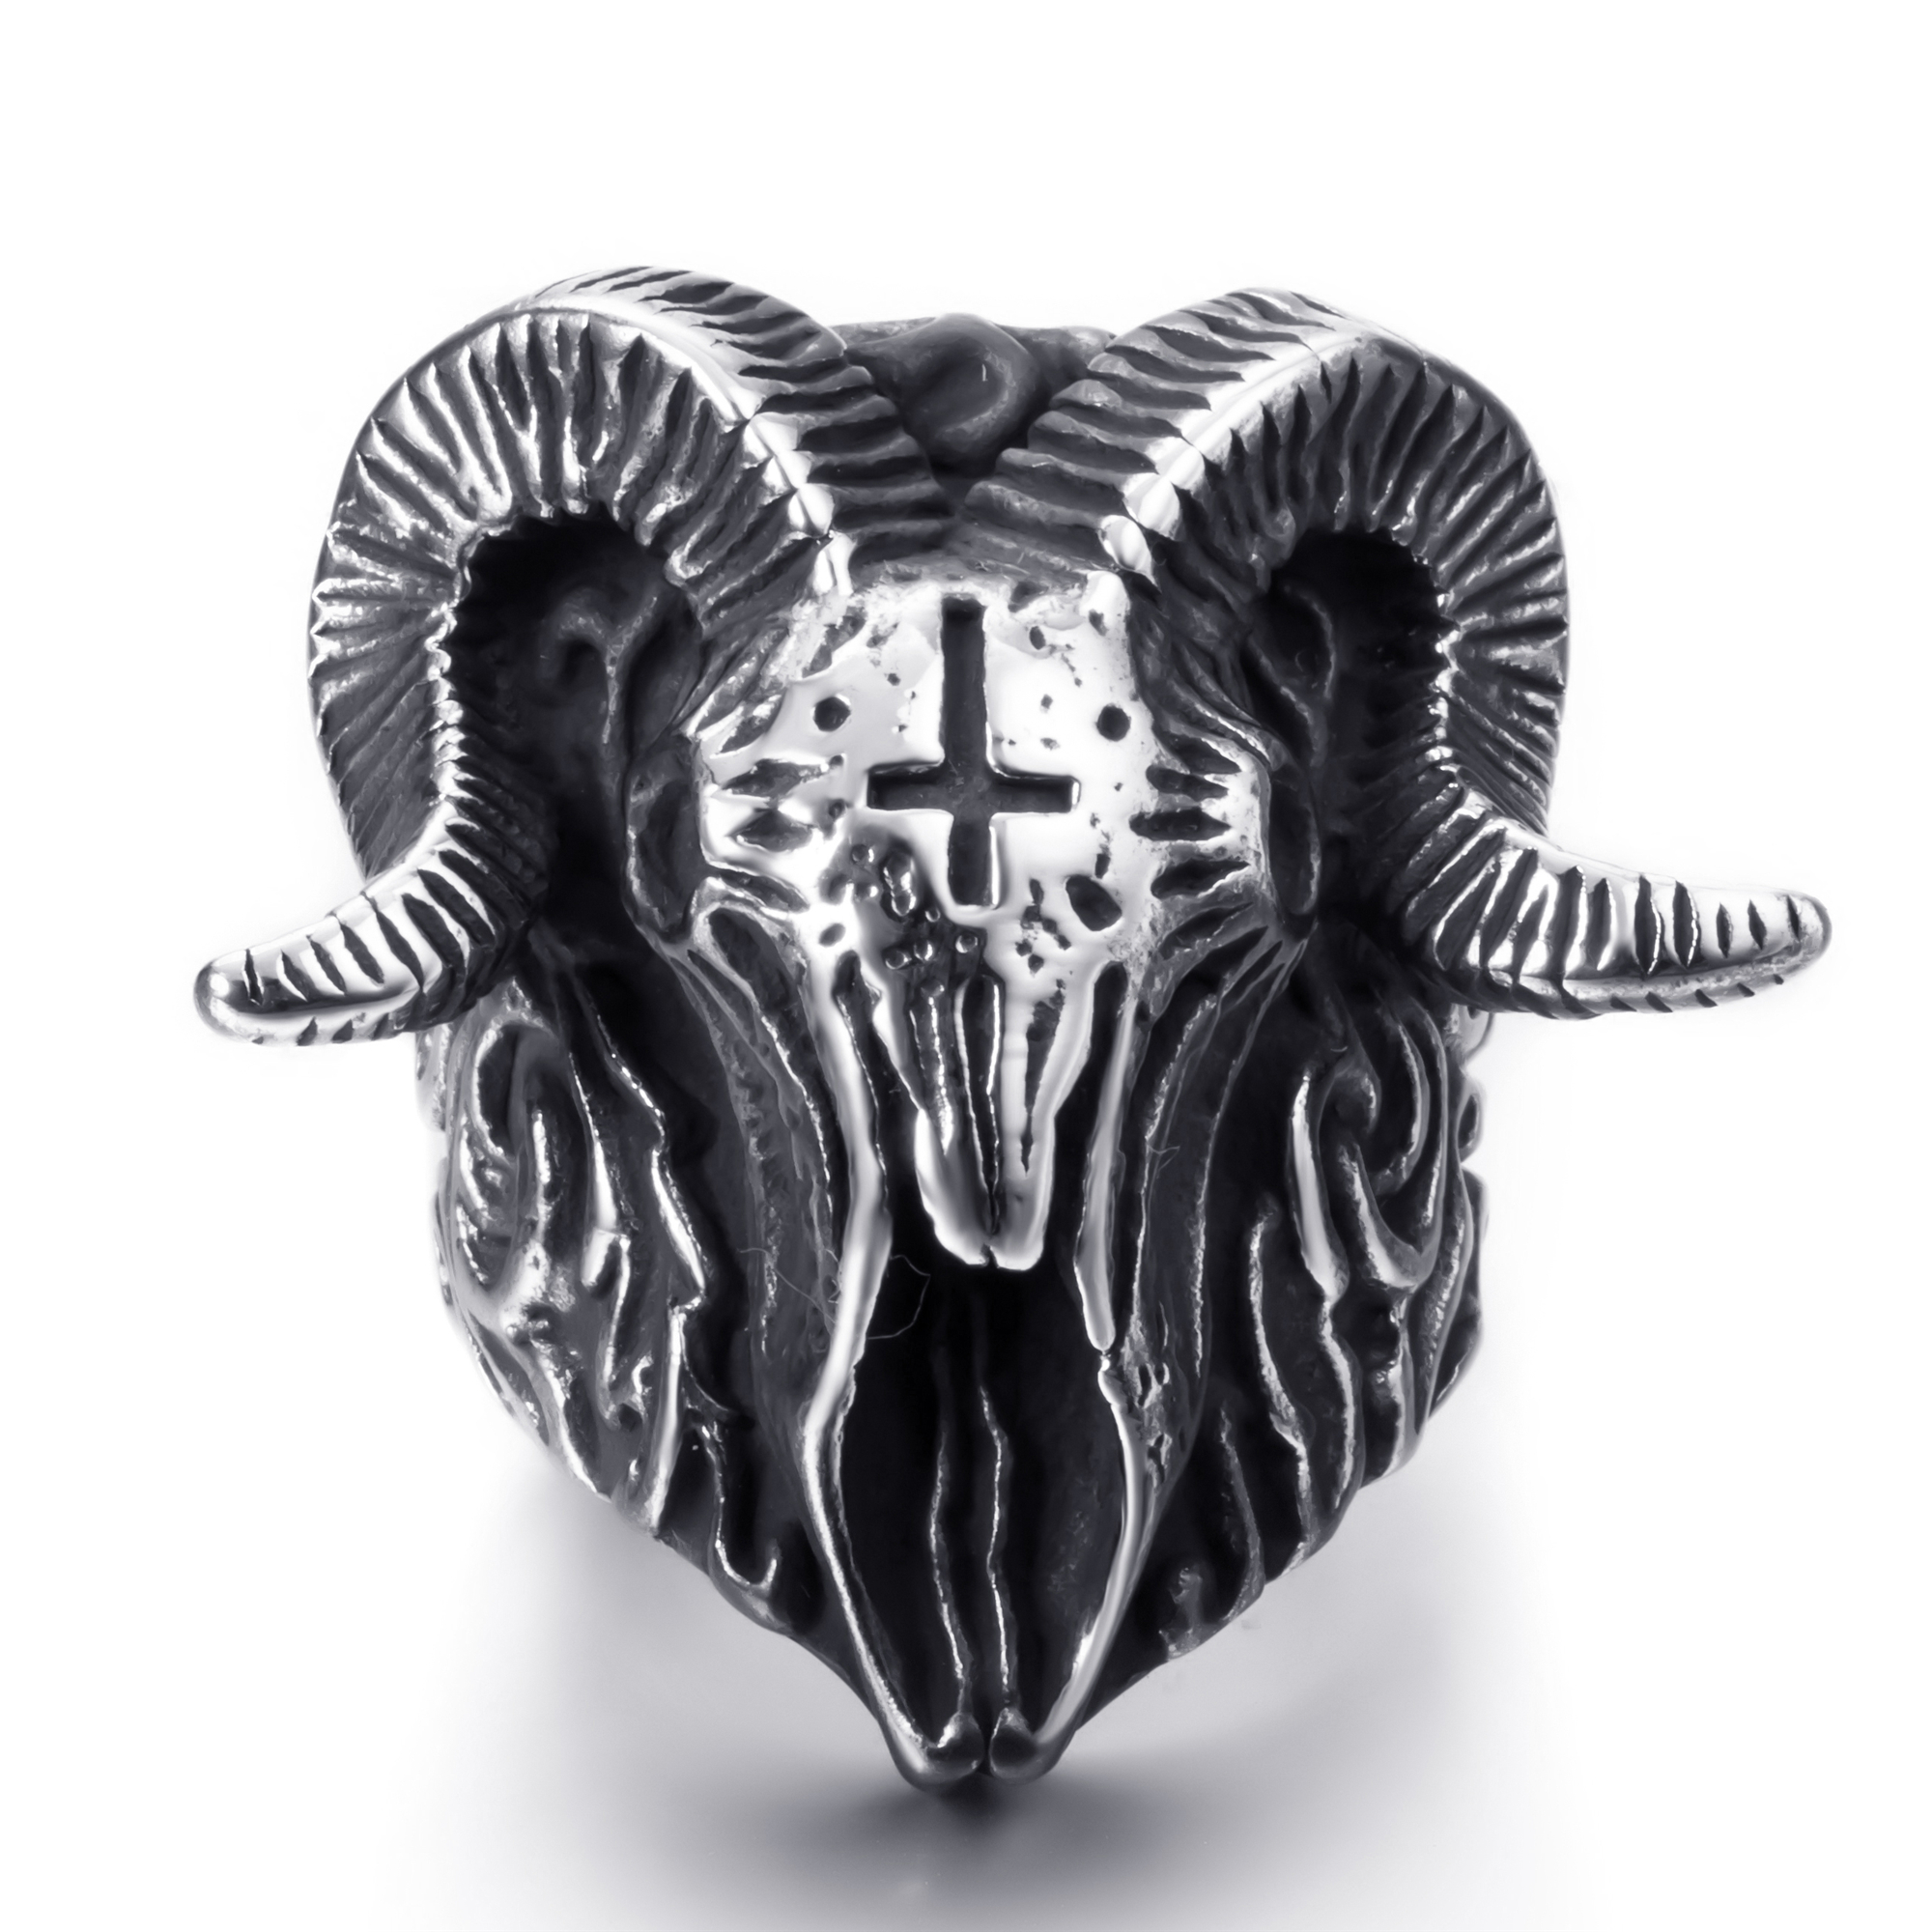 Altar 3.0 Ring In Sterling Silver Brutalist Modern Cyberpunk steampunk Primitive Oxidized Dark Fashion Signet Hand Carved Talisman Warrior